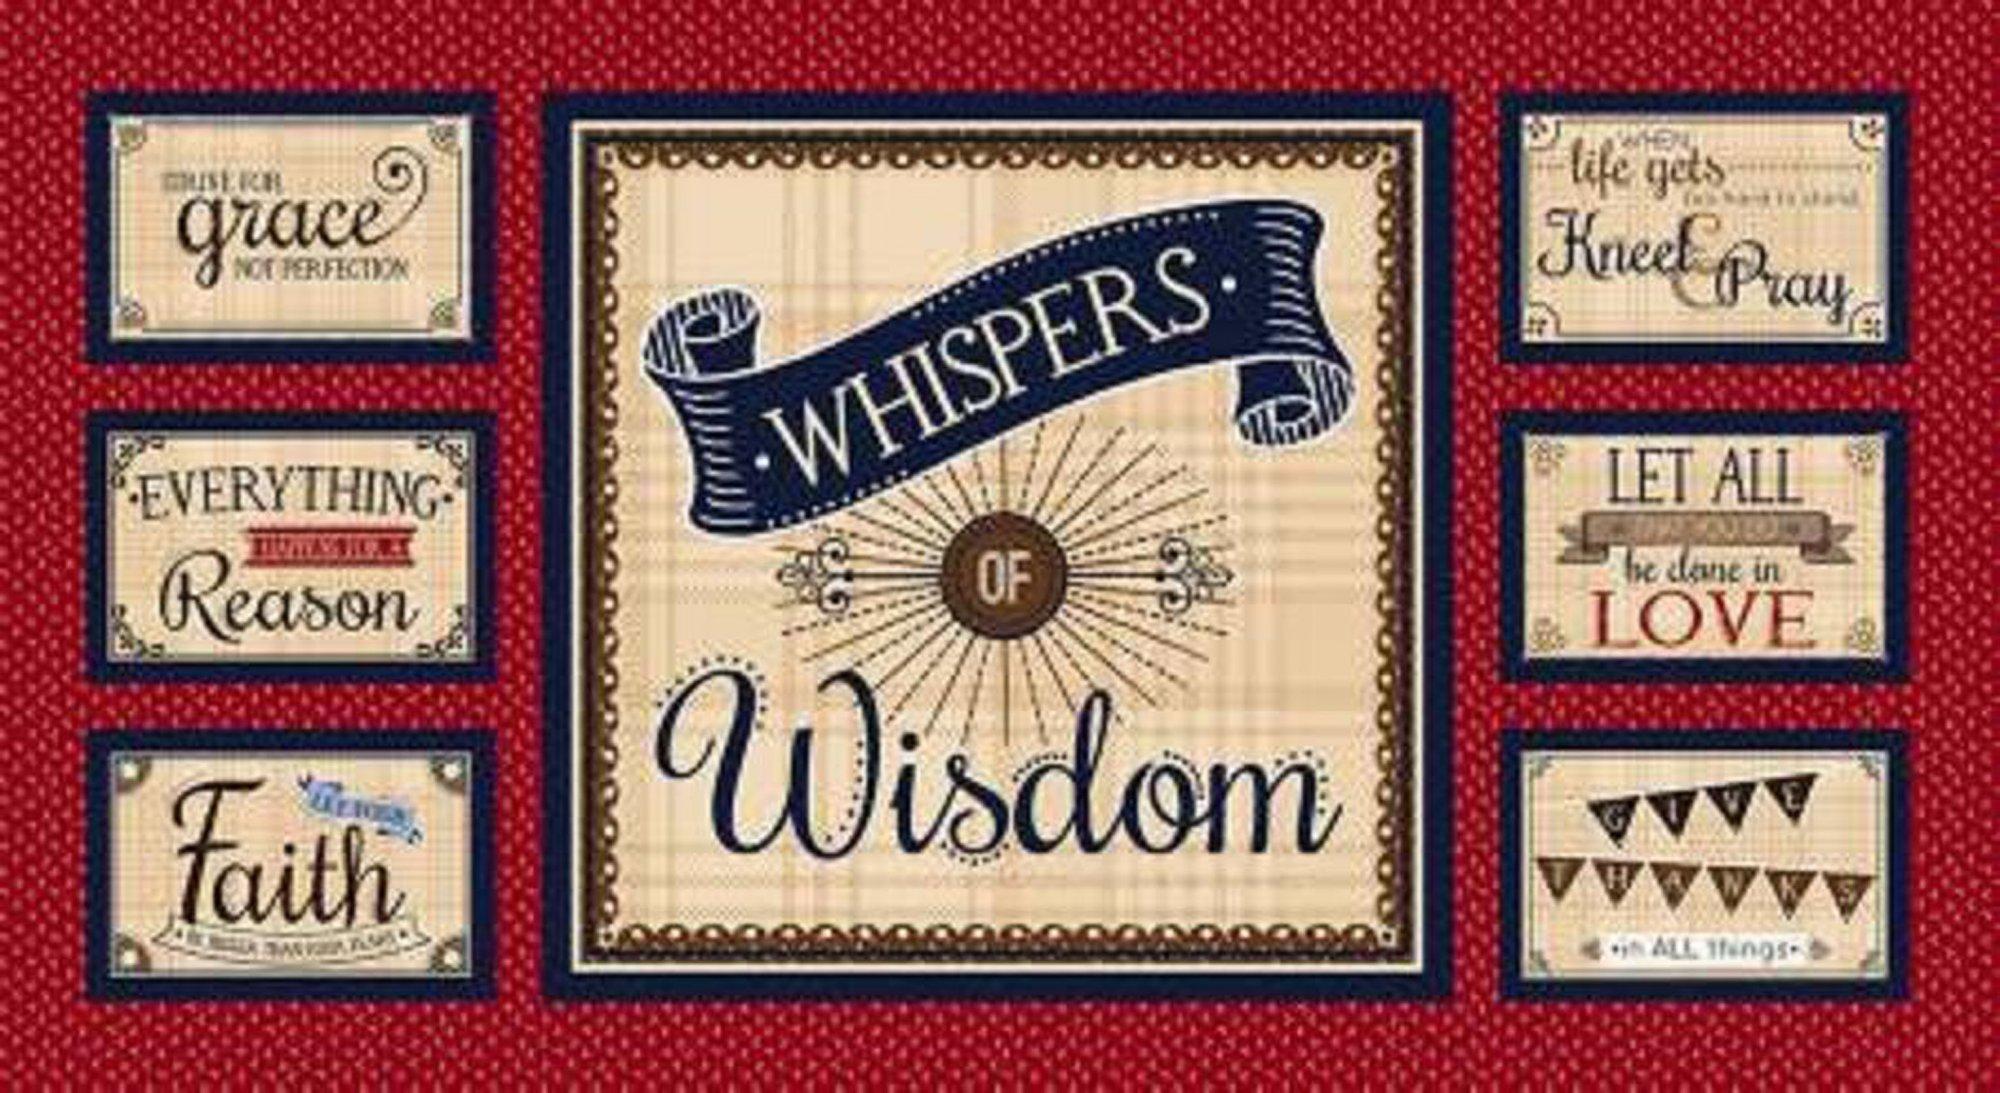 Henry Glass - Whispers of Wisdom panel